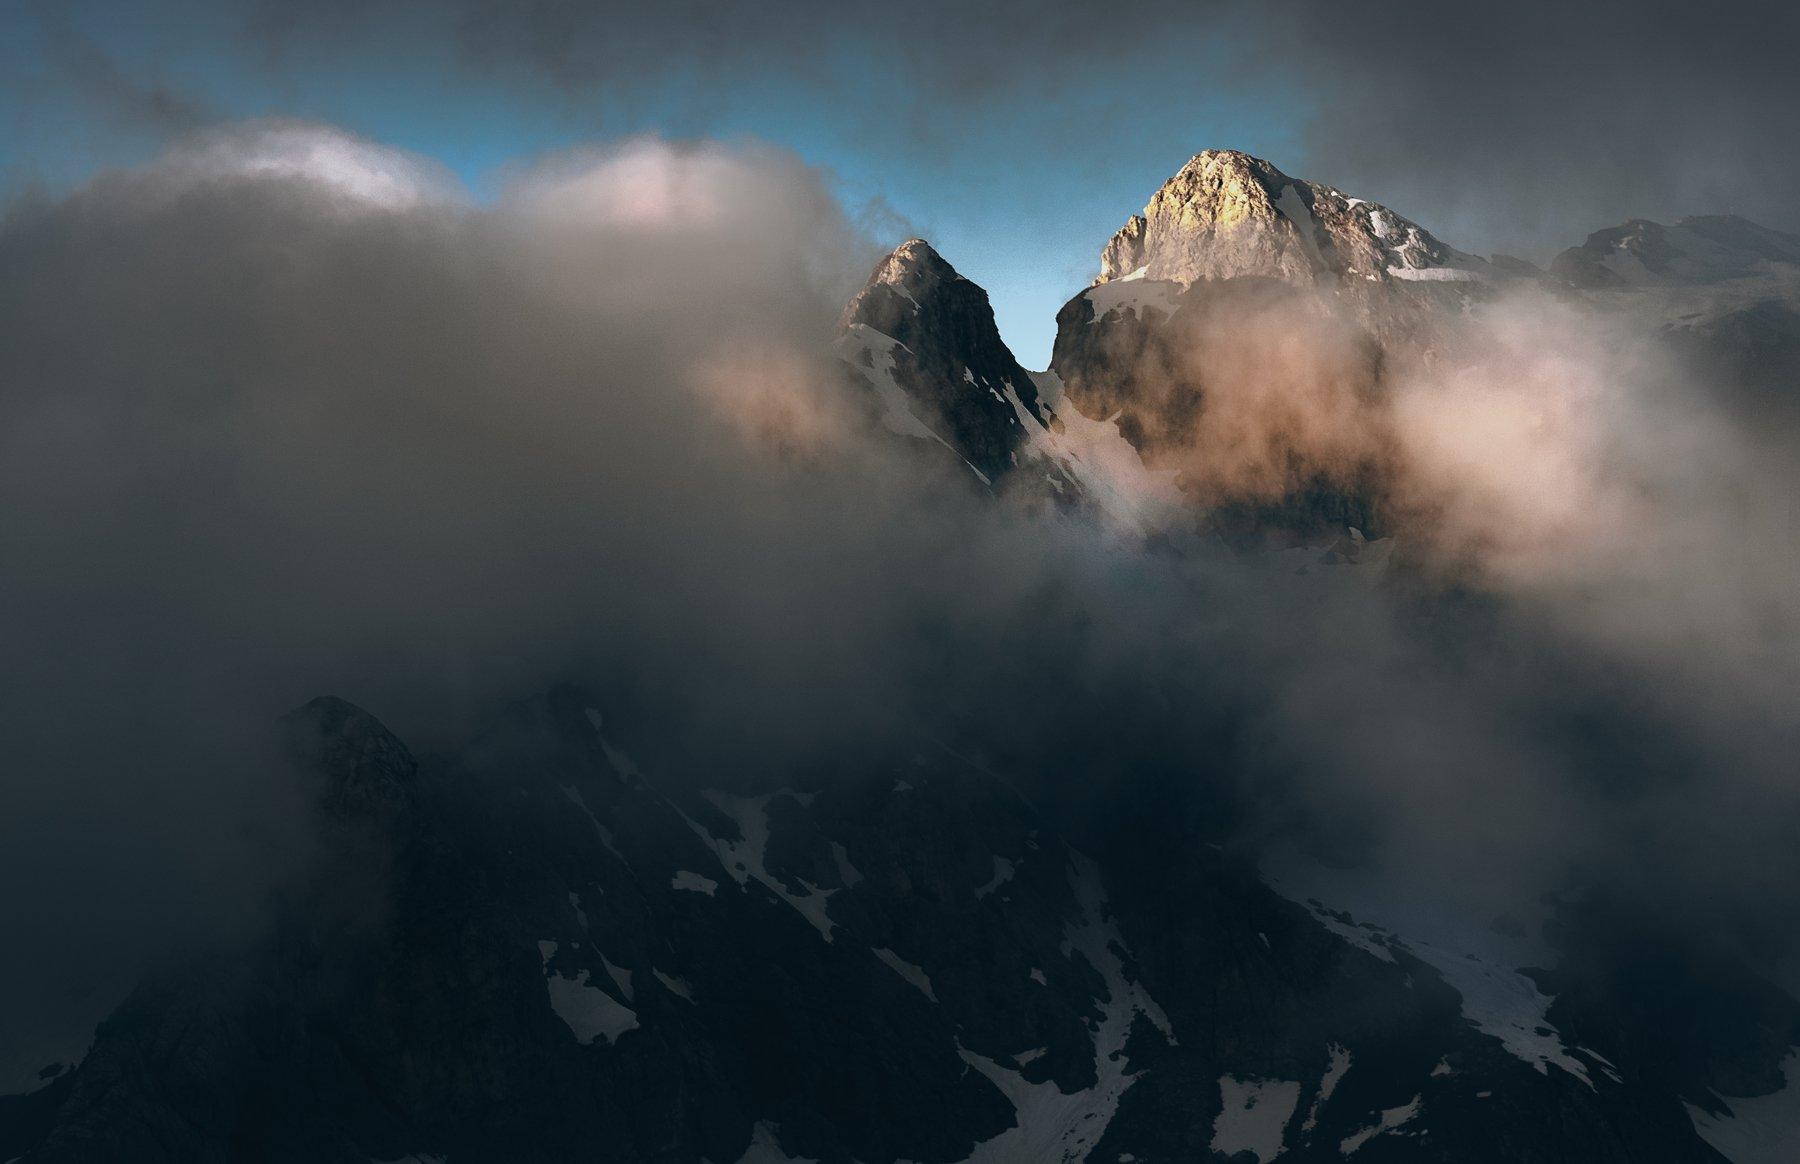 dolomiti, moon, alpi, panorama, giao, Bykov Sergey